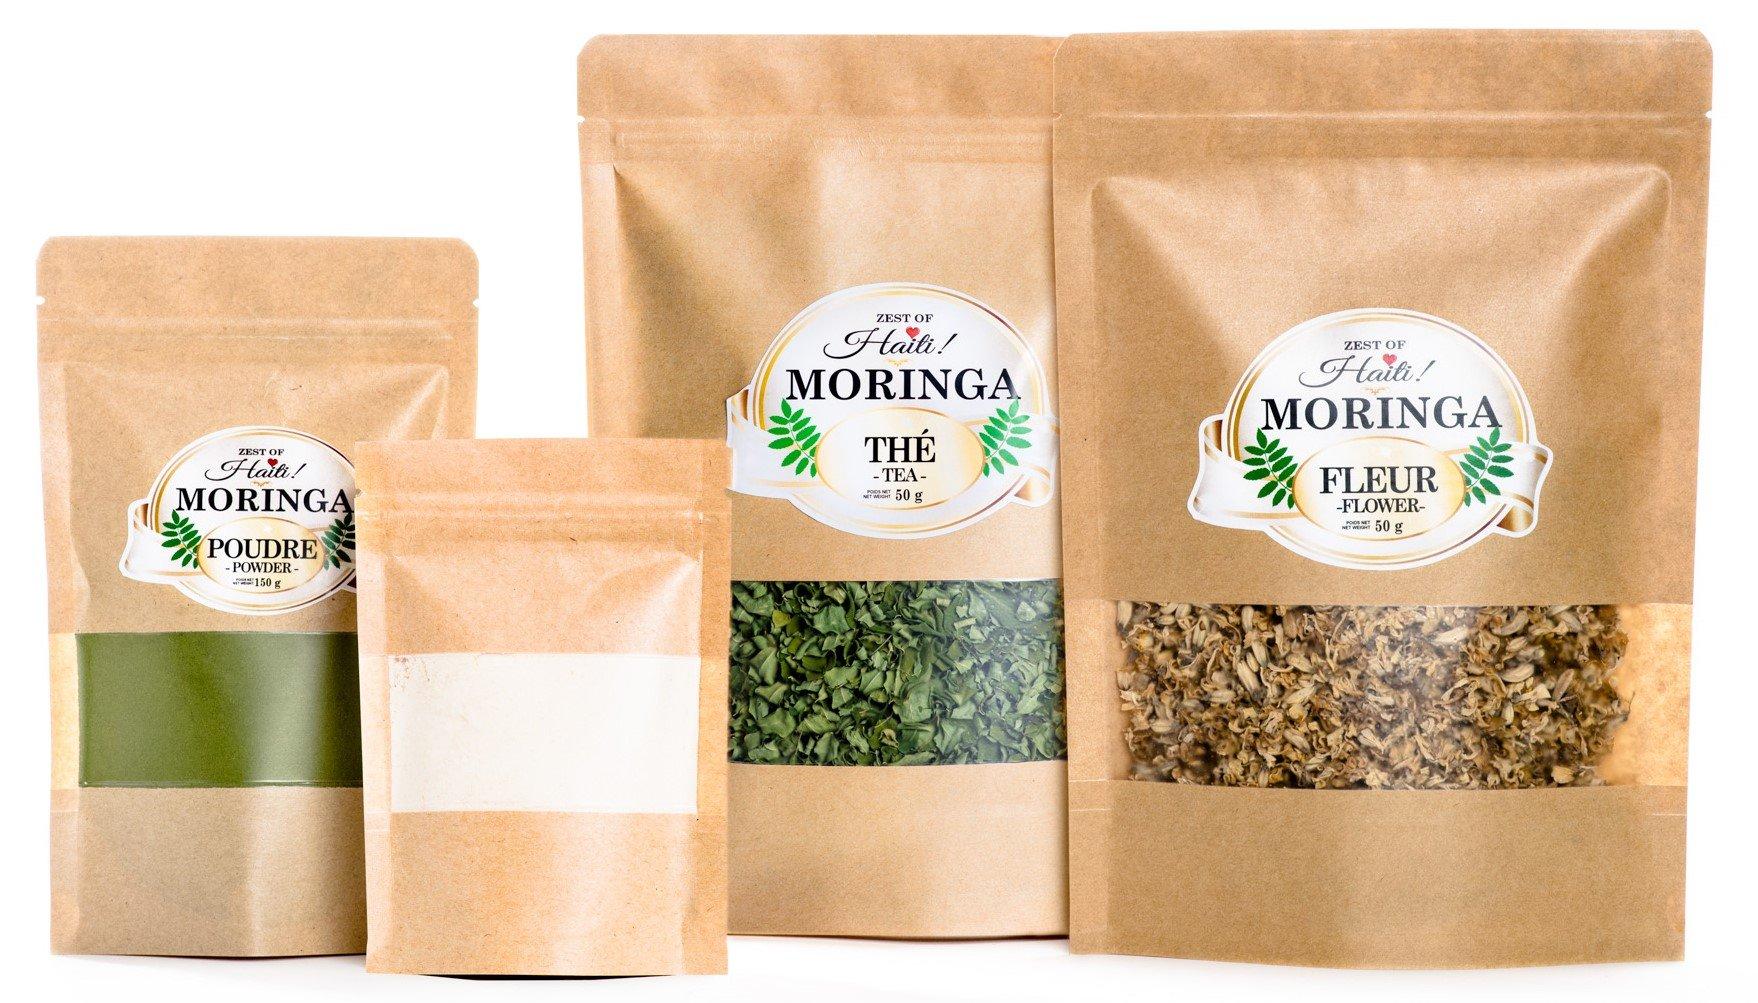 Moringa Oleifera Weight Loss Bundle -100% Organic Certified Moringa Diet Supplements- Burn Fat, Effortless Weight Loss Treatment With Bio Nutriments